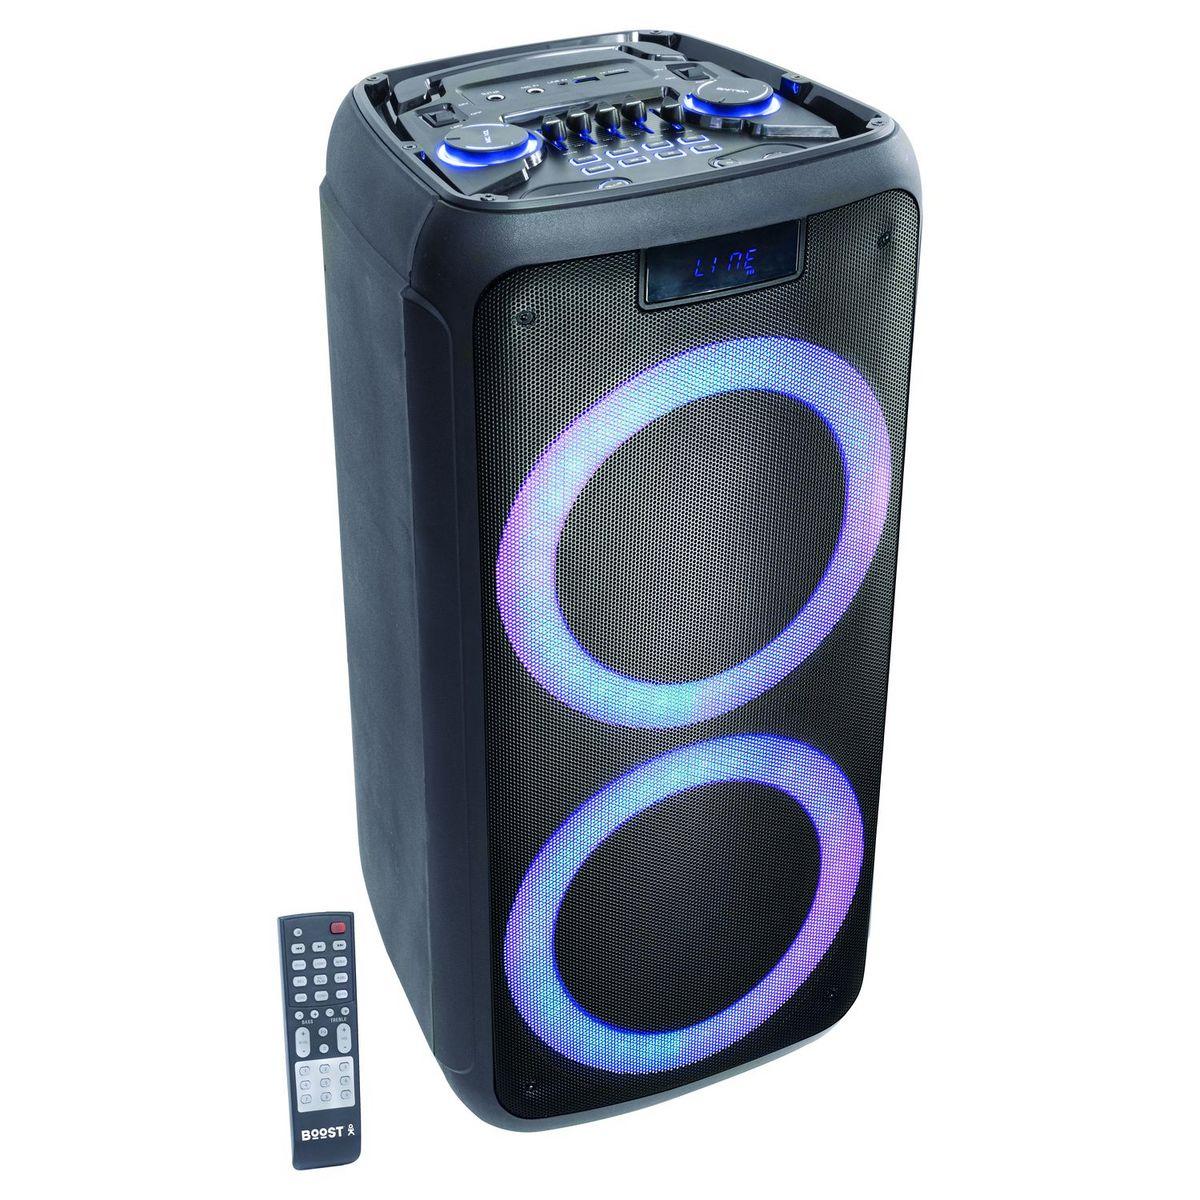 Enceinte Bluetooth - Noir - Boost-Luna50